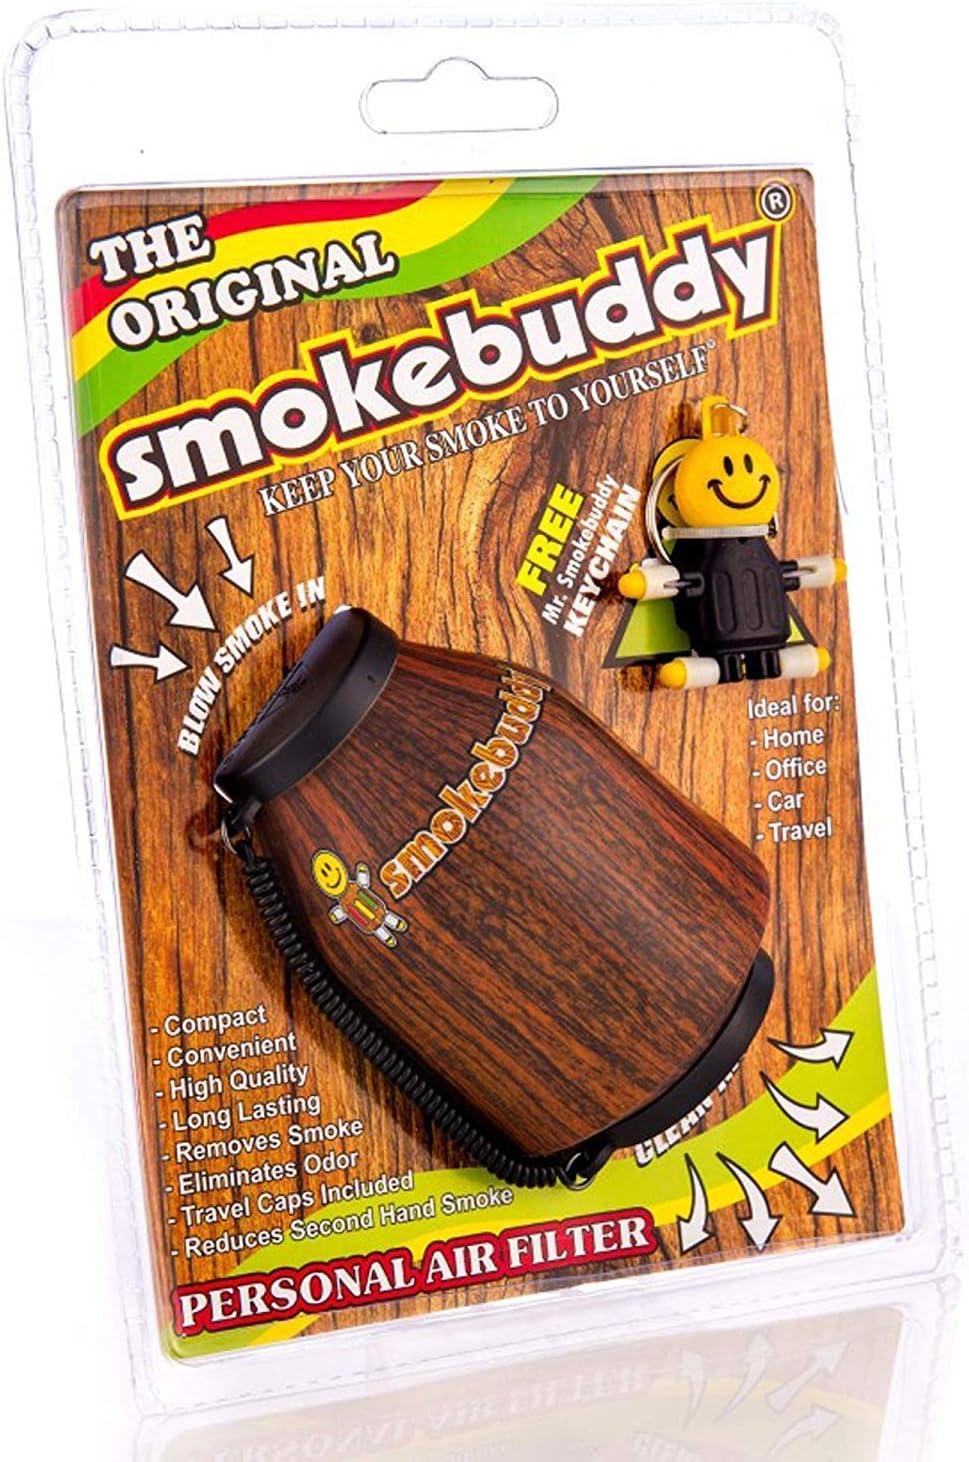 Grenade Smoke Buddy Grenade Air Purifier Includes Keychain /& Free WENEED Doob Tube Original Portable Filter Removes Odor R